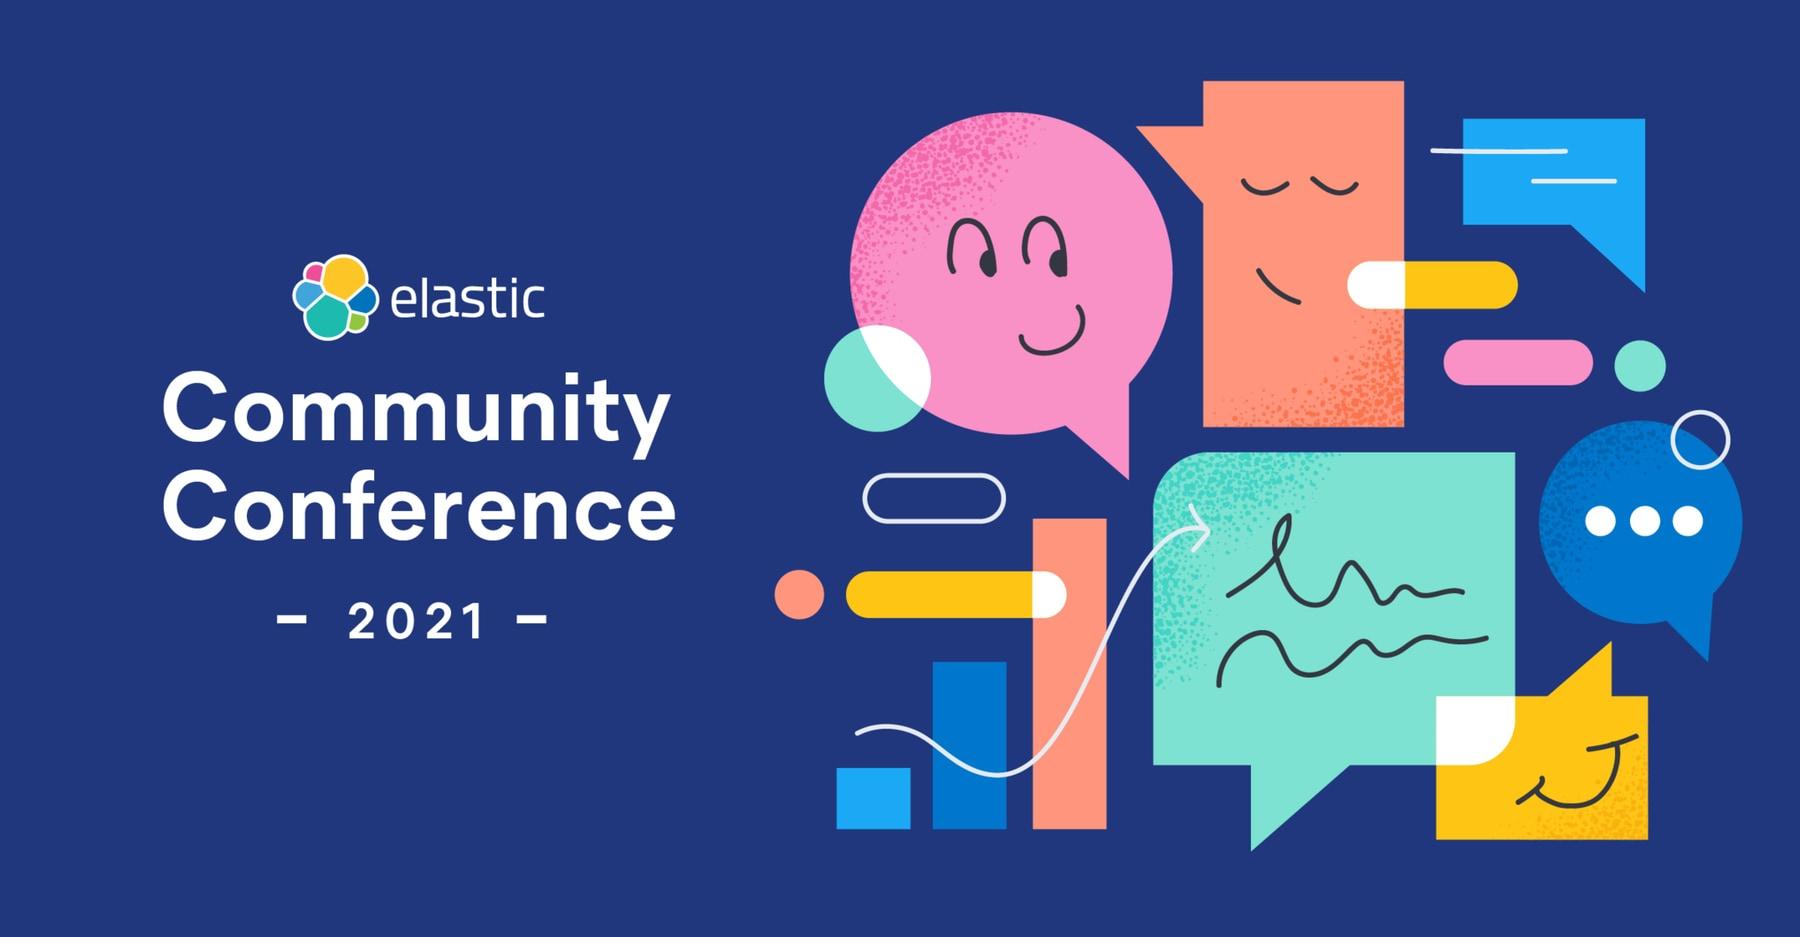 Elastic Community Conference logo